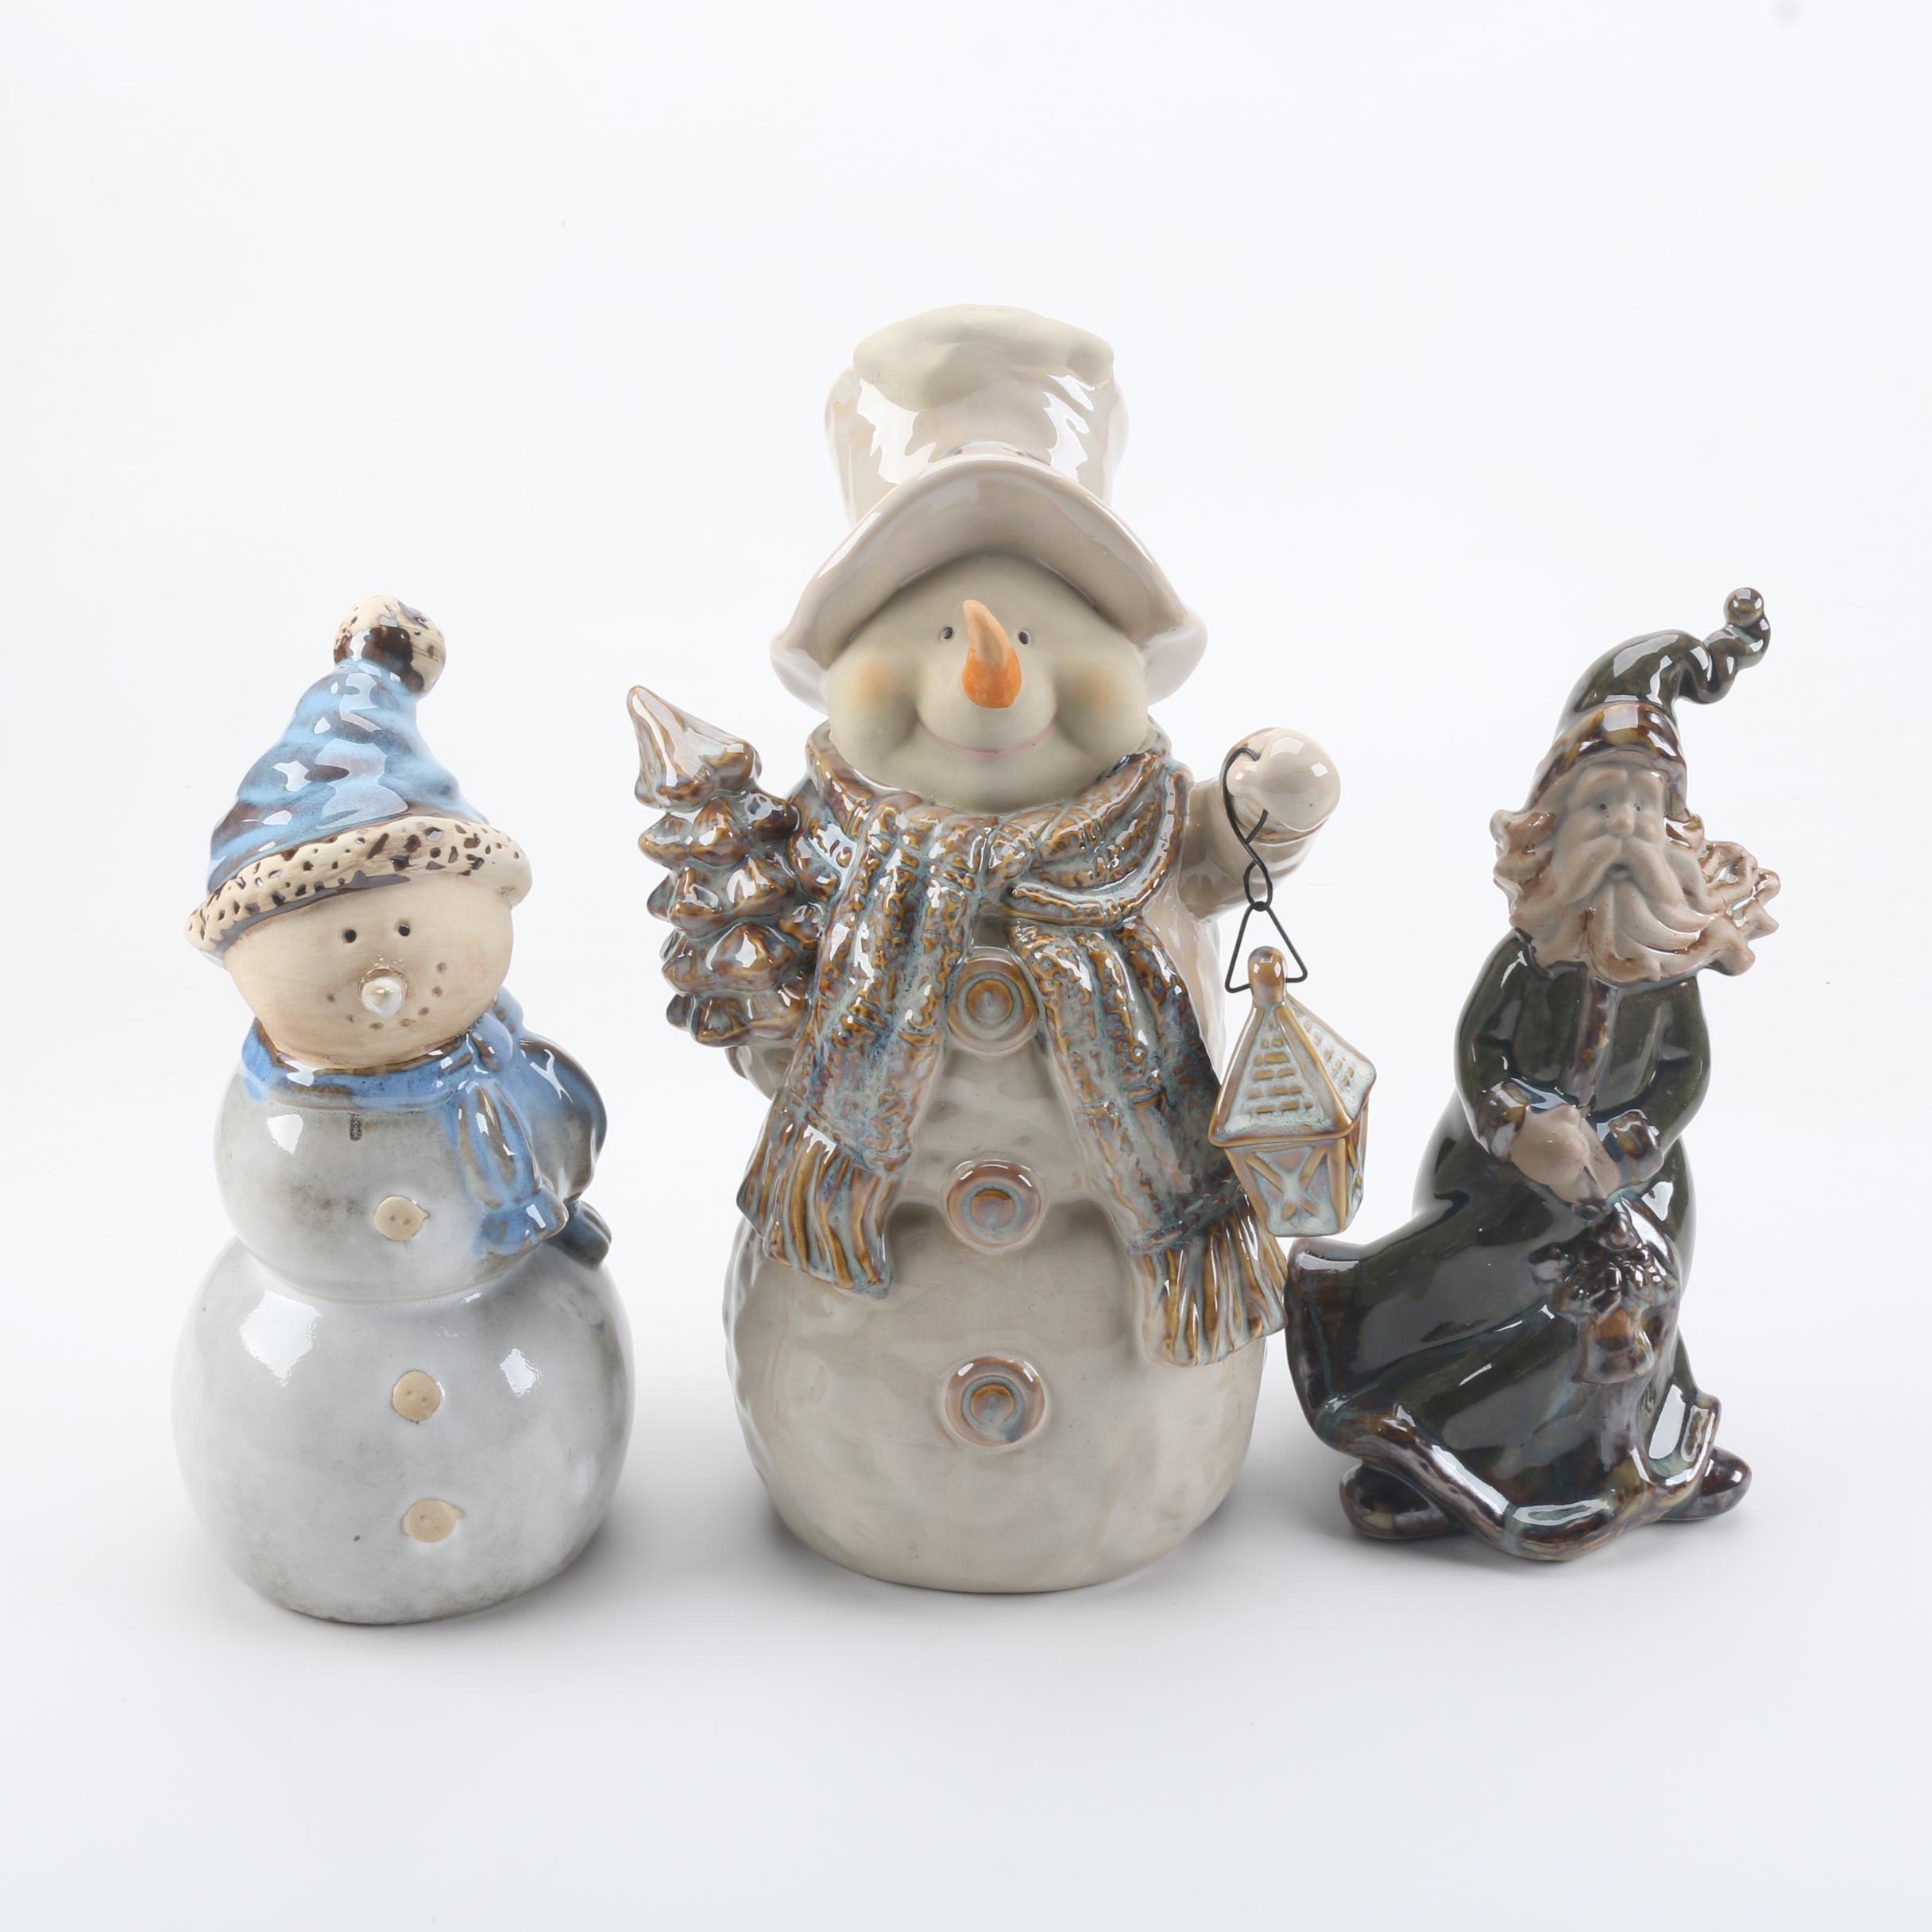 Snowman Figurines